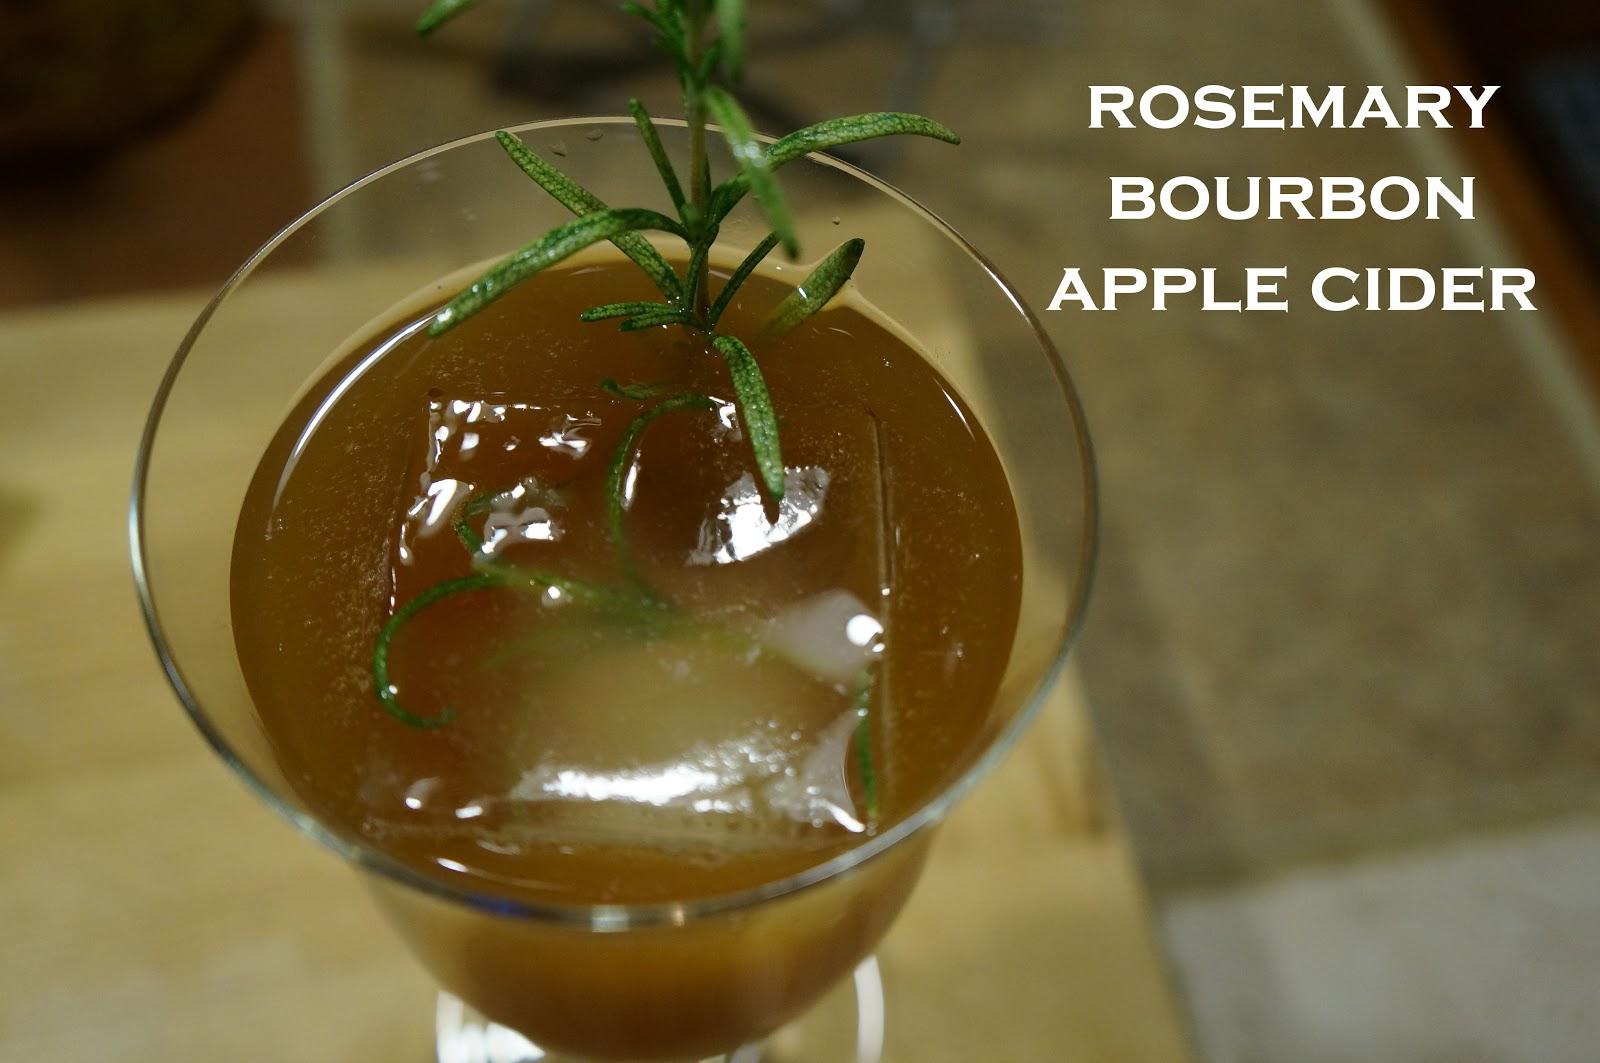 adorned abode: Rosemary Bourbon Apple Cider Cocktail